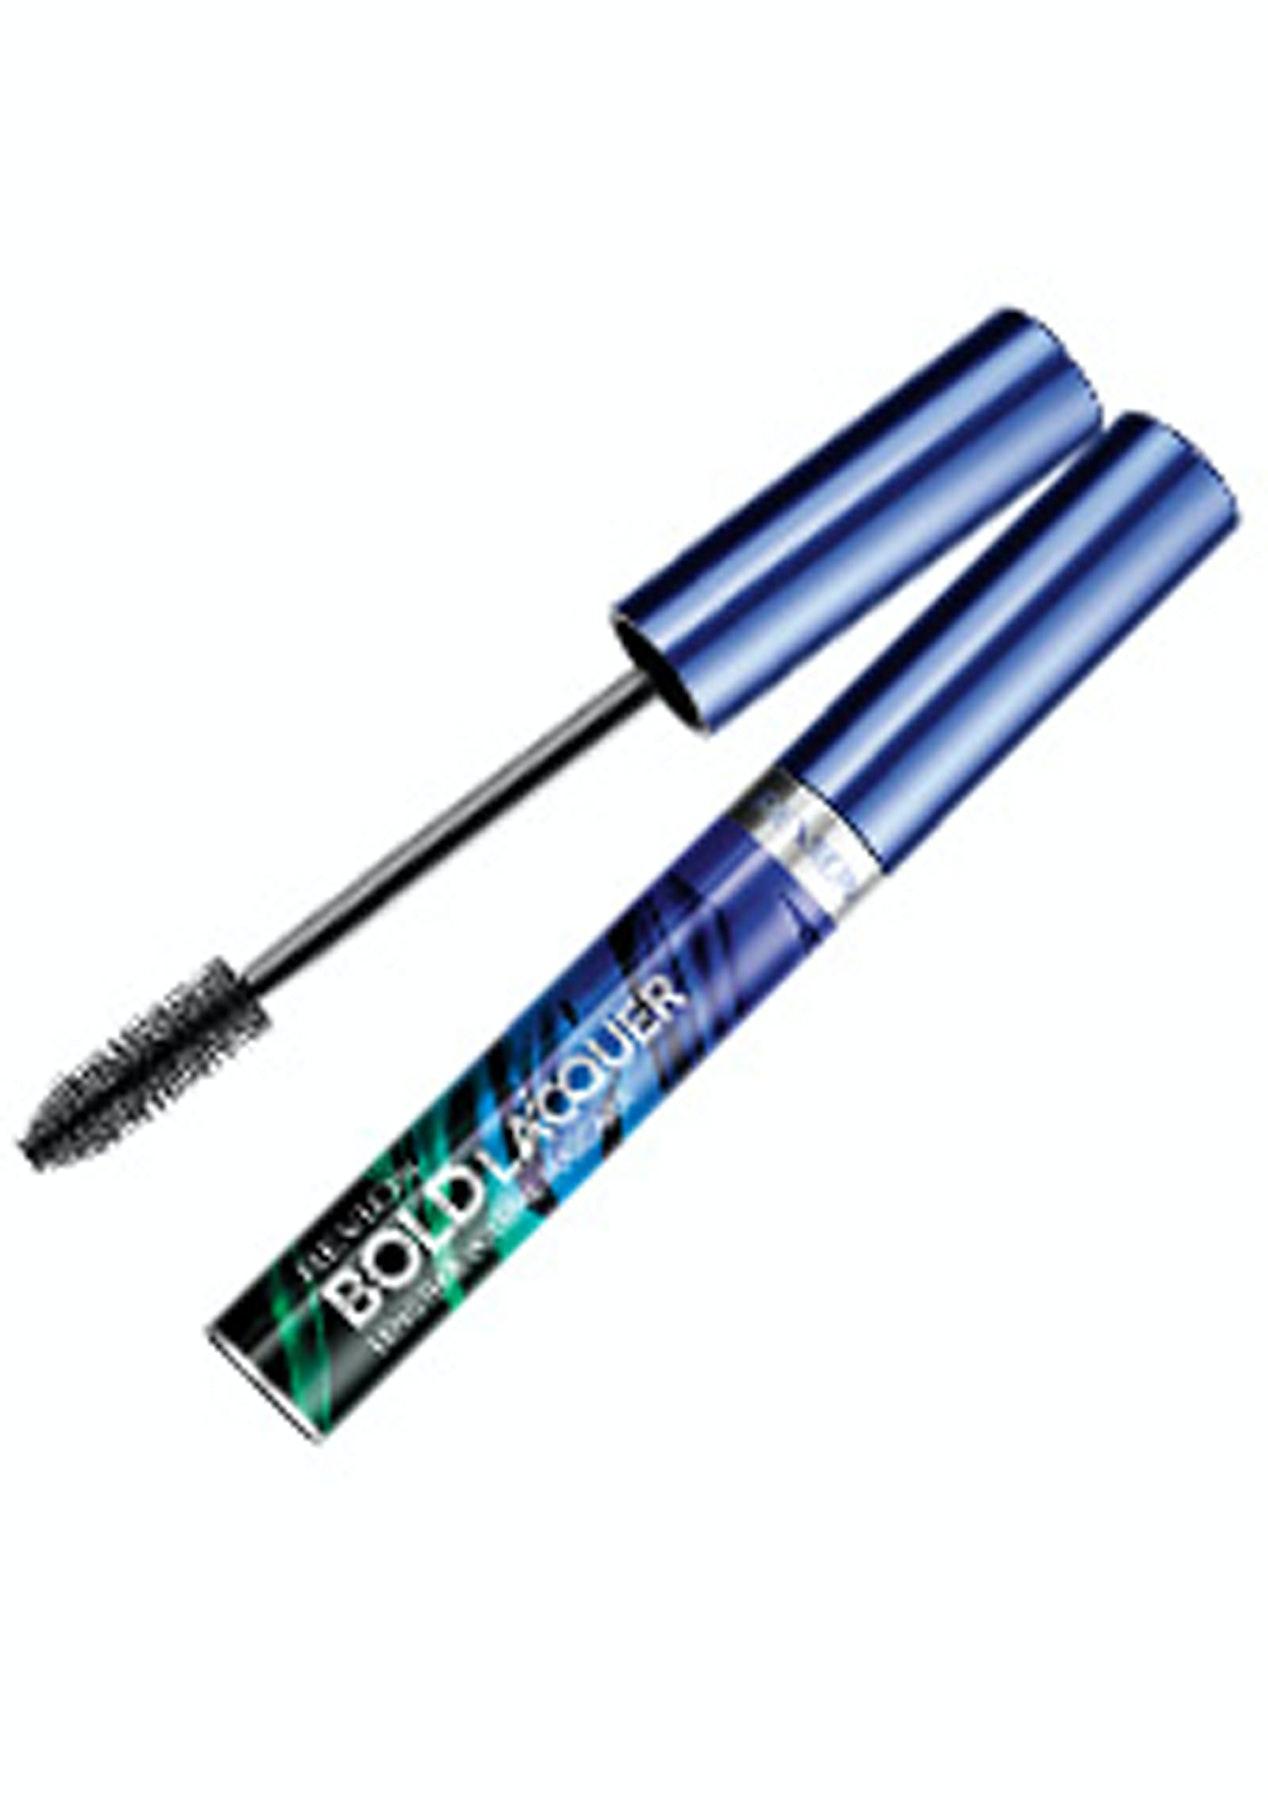 Revlon Grow Luscious Bold Lacquer Waterproof Mascara Blackest Black Eyeliner Under 20 Beauty Warehouse Onceit